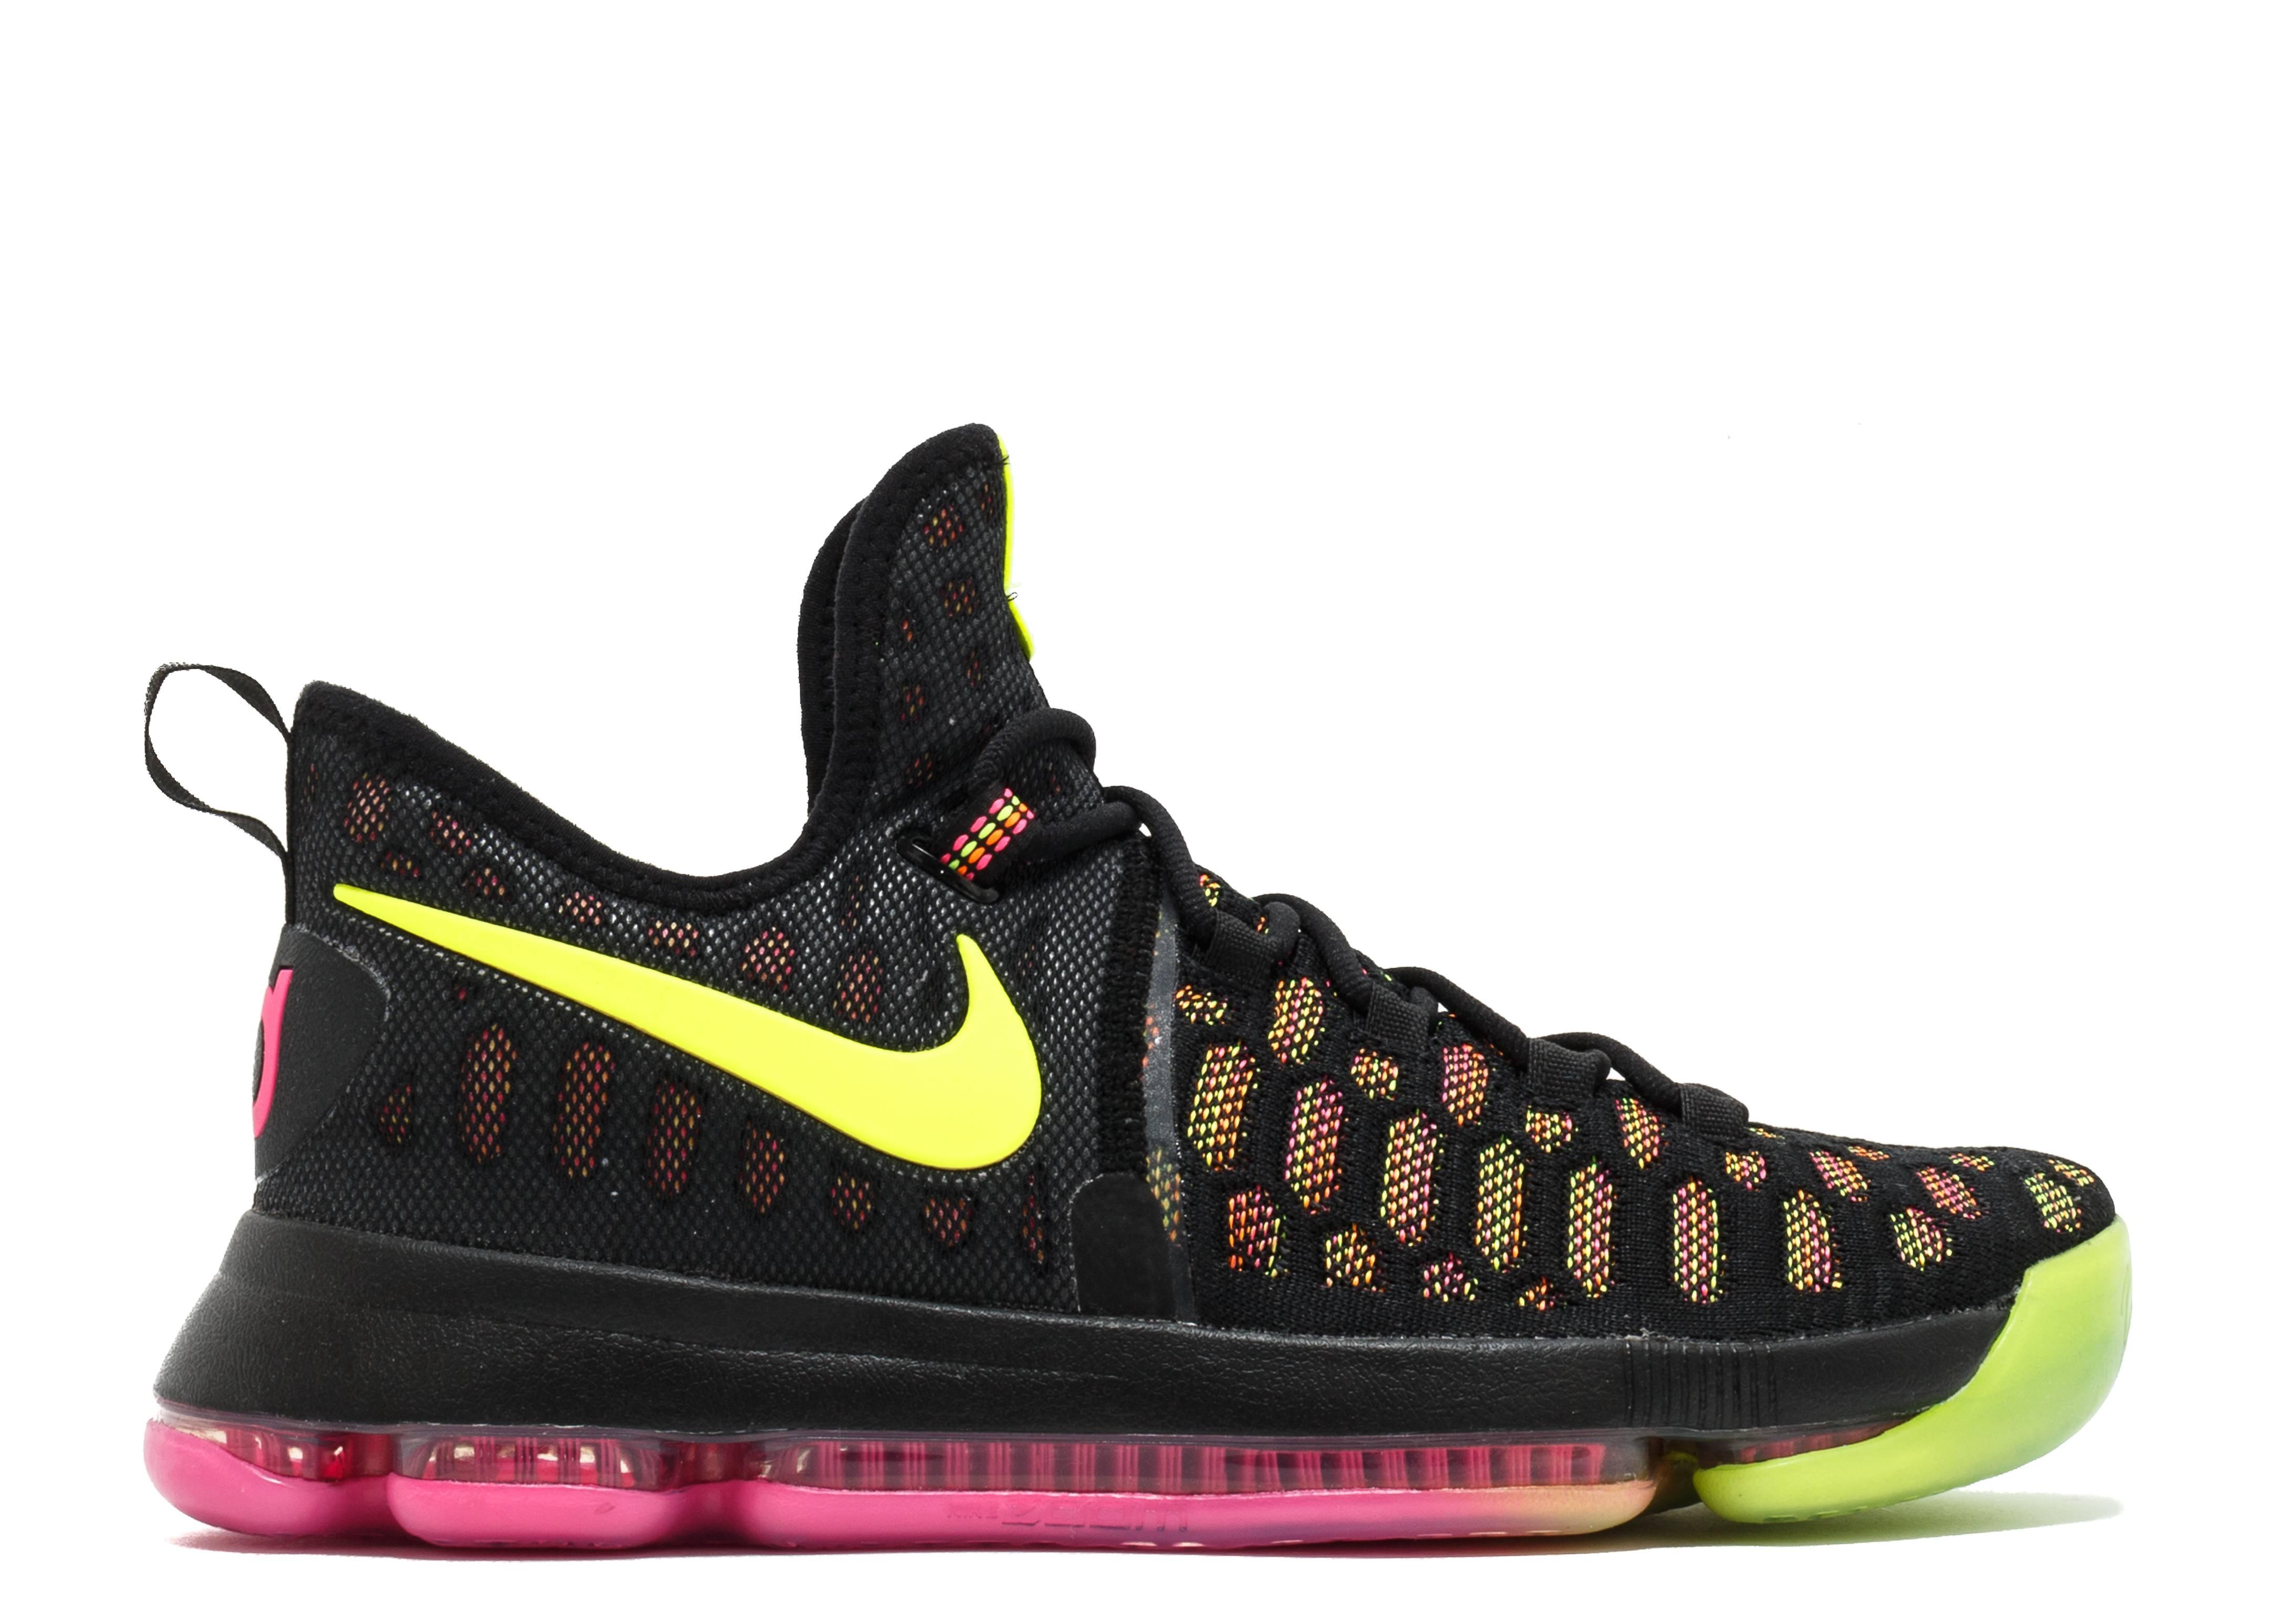 best sneakers 2e0aa 28f89 Zoom Kd 9 - Nike - 843392 999 - multi-color multi-color   Flight Club